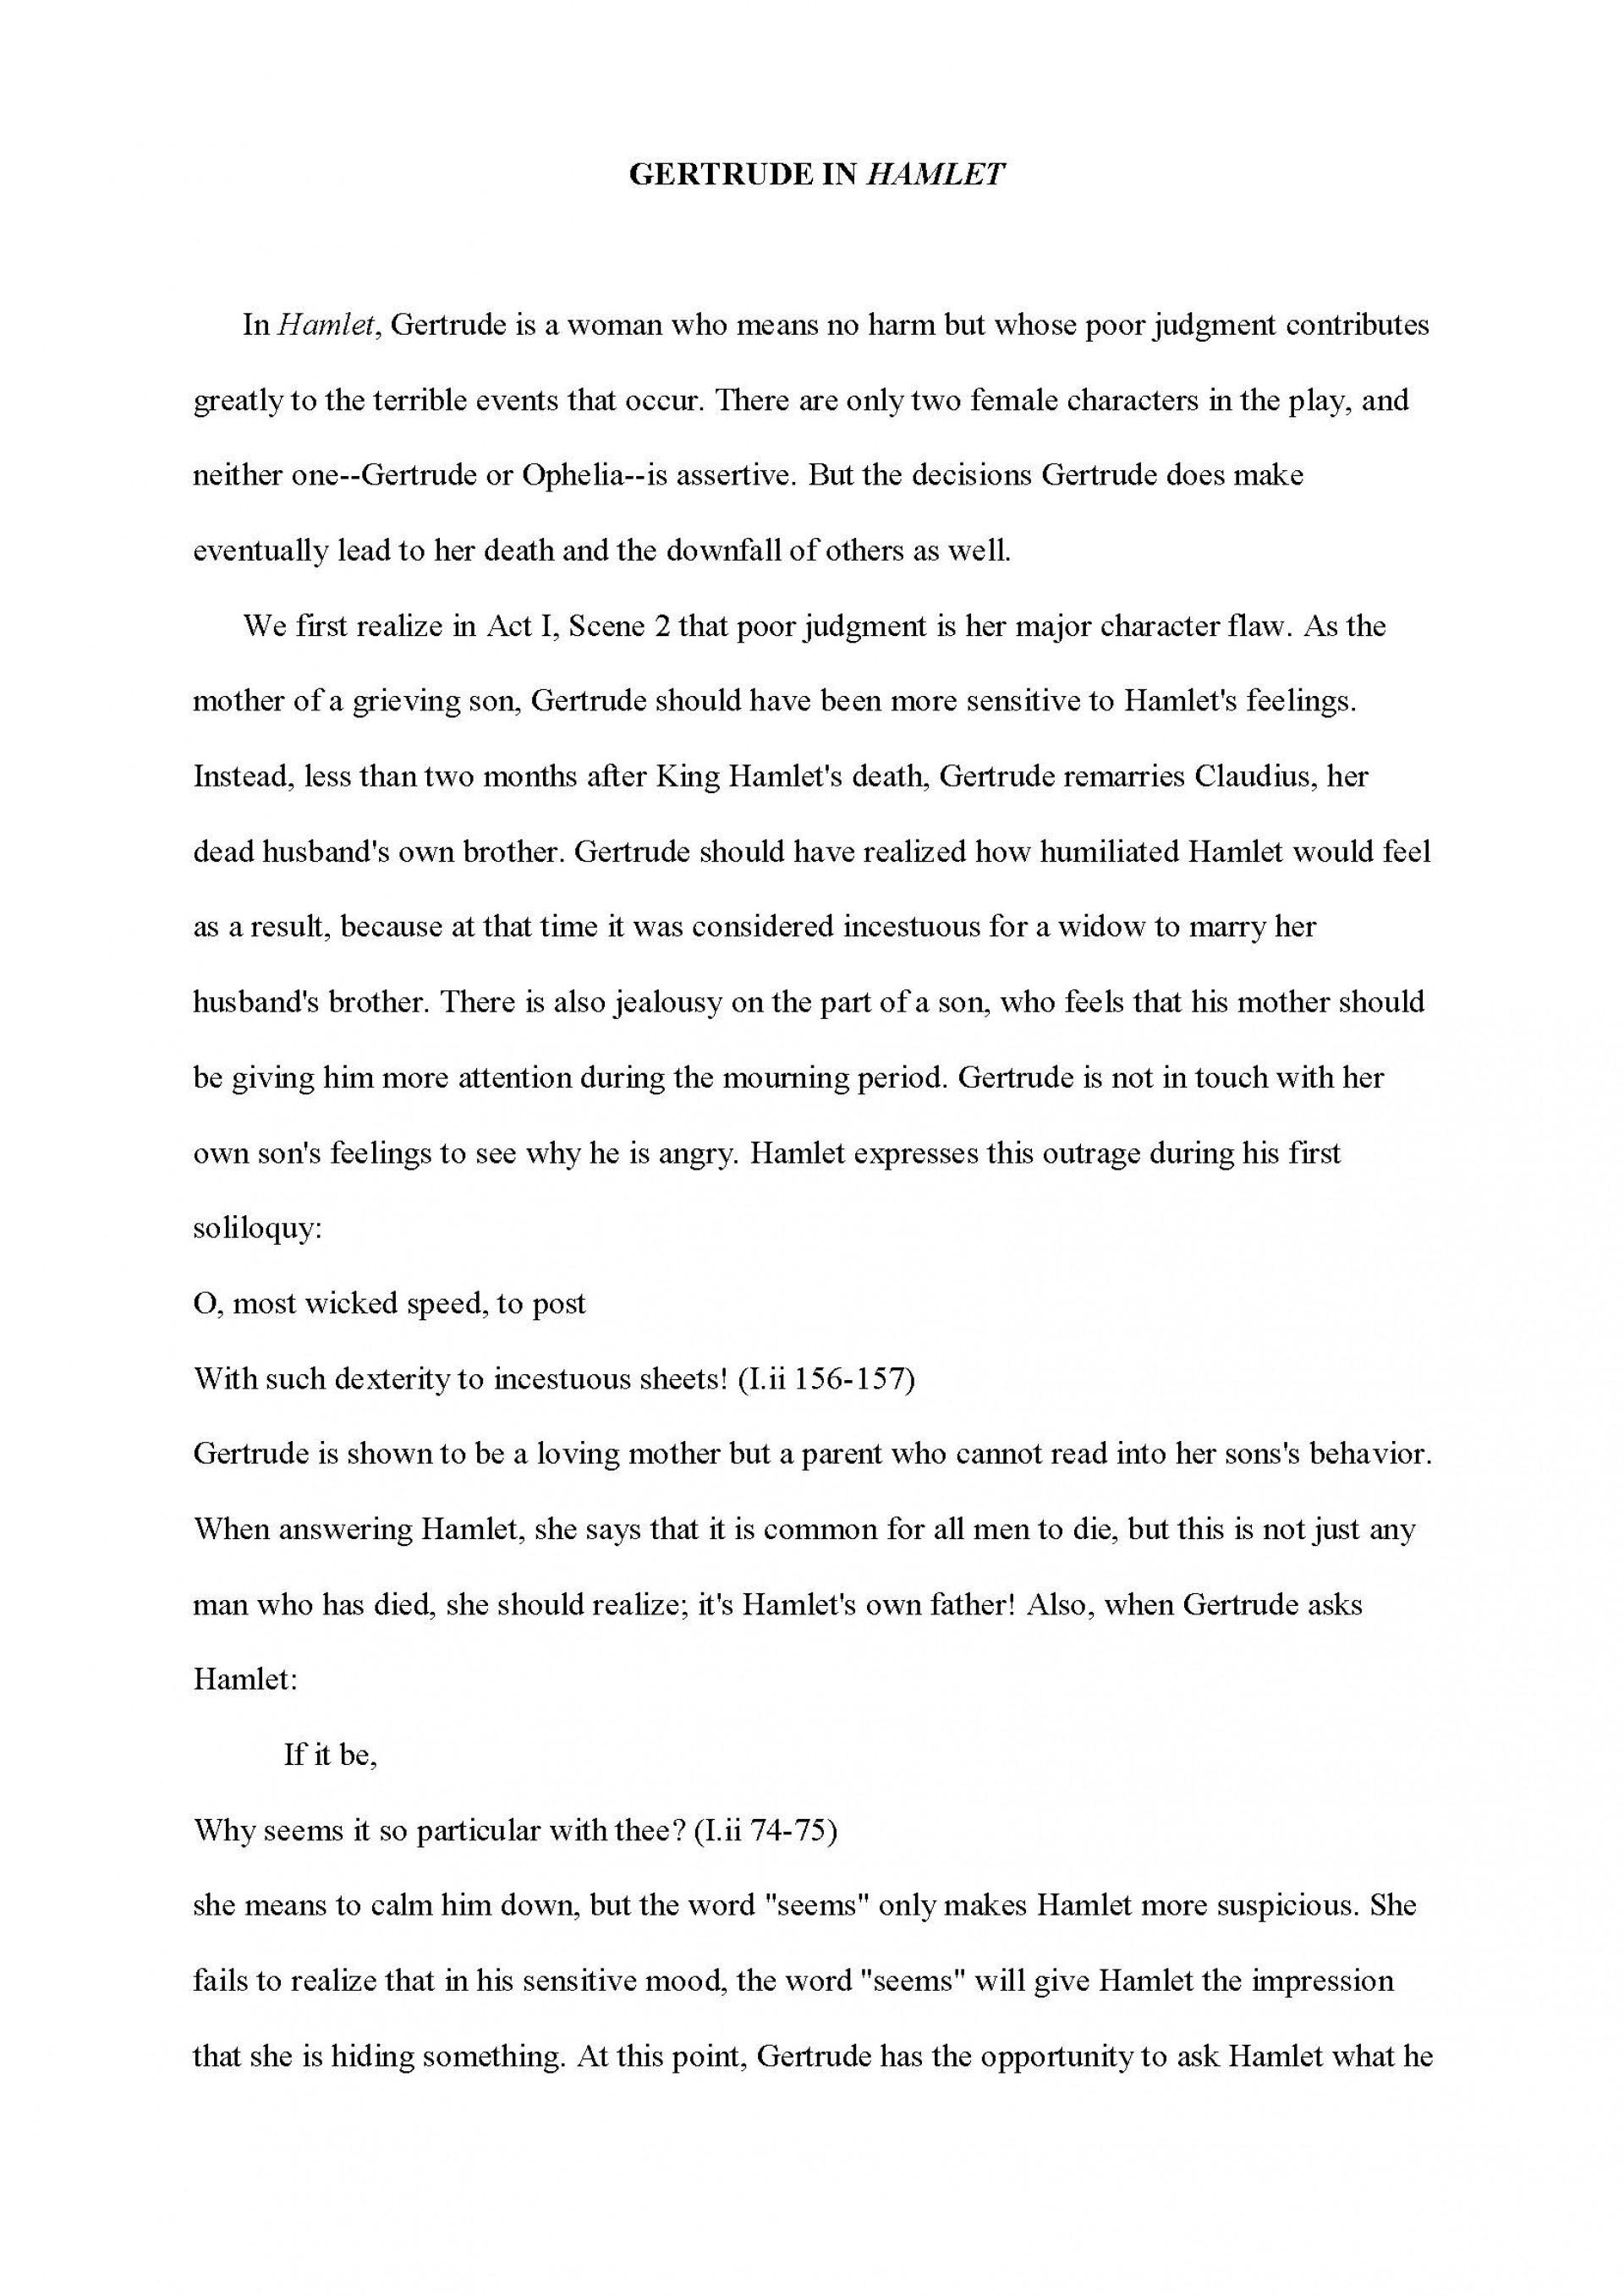 001 Analysis Essay Sample Summarys For Essays Best Summary Examples 1920